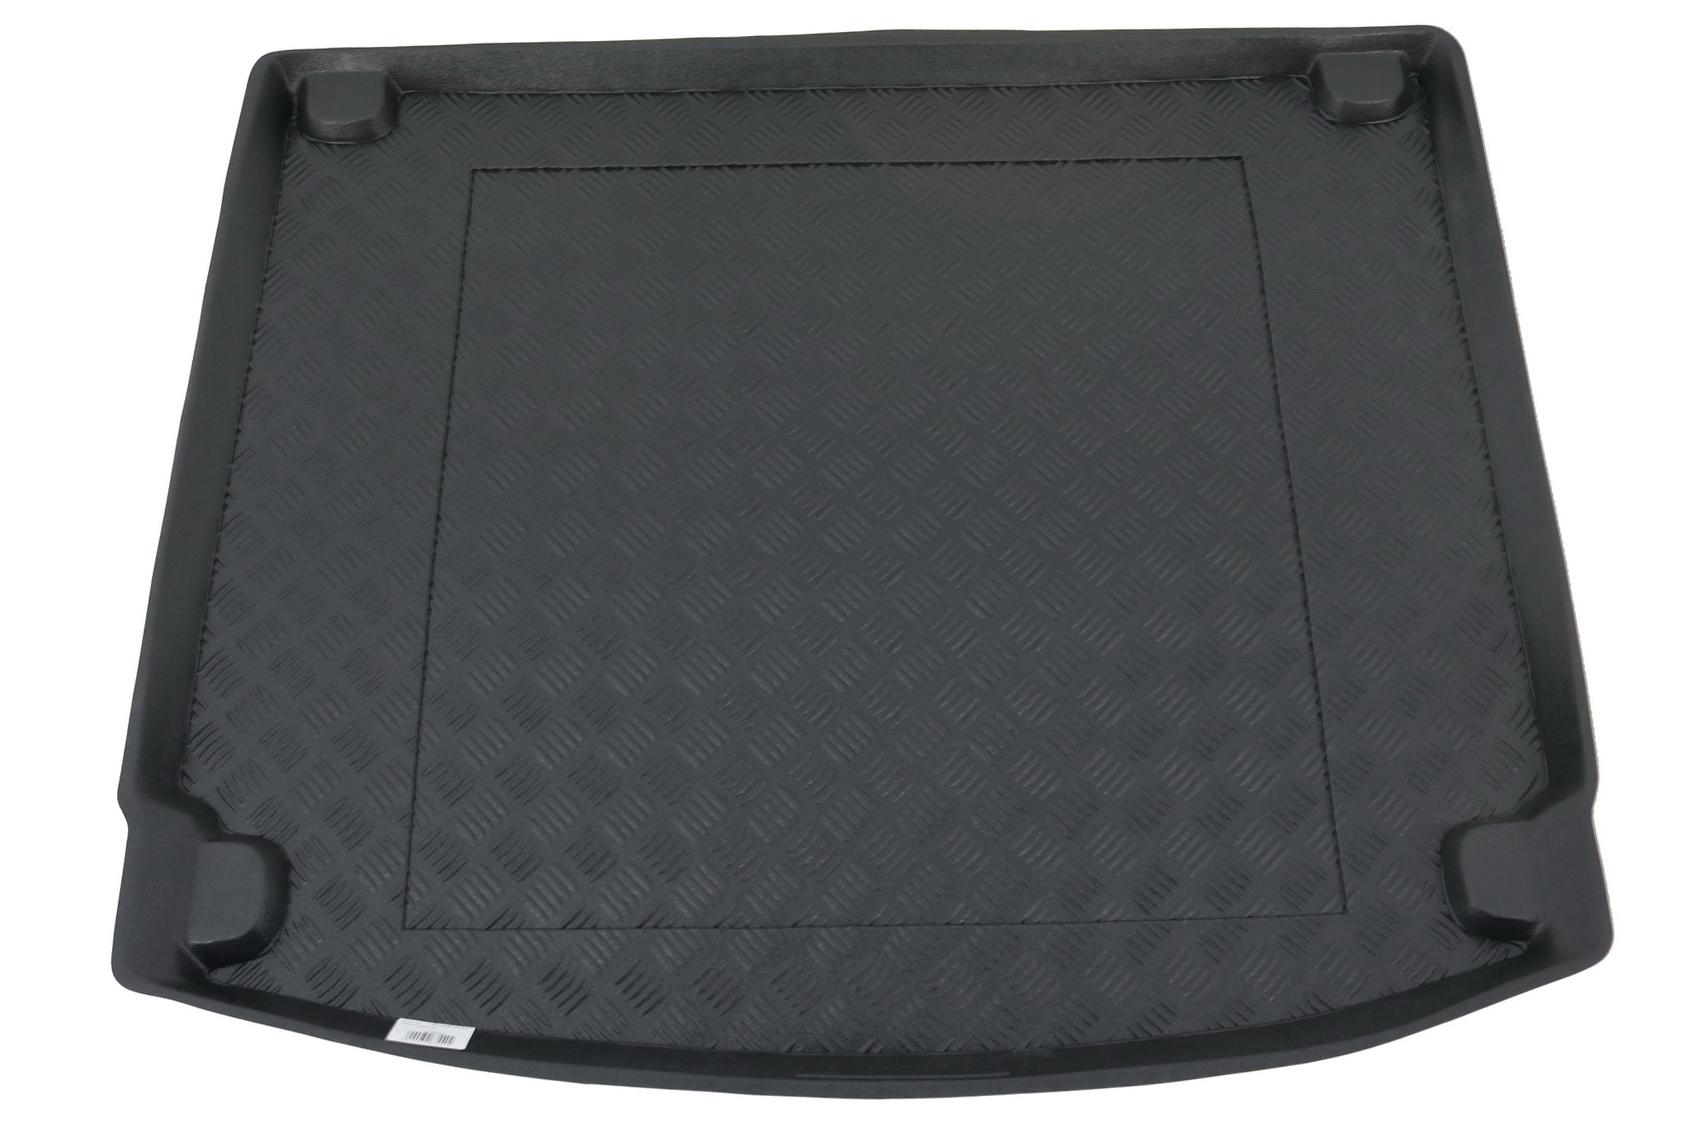 Covoras tavita portbagaj compatibil cu PORSCHE CAYENNE II (Typ 92A) (2010-2017)